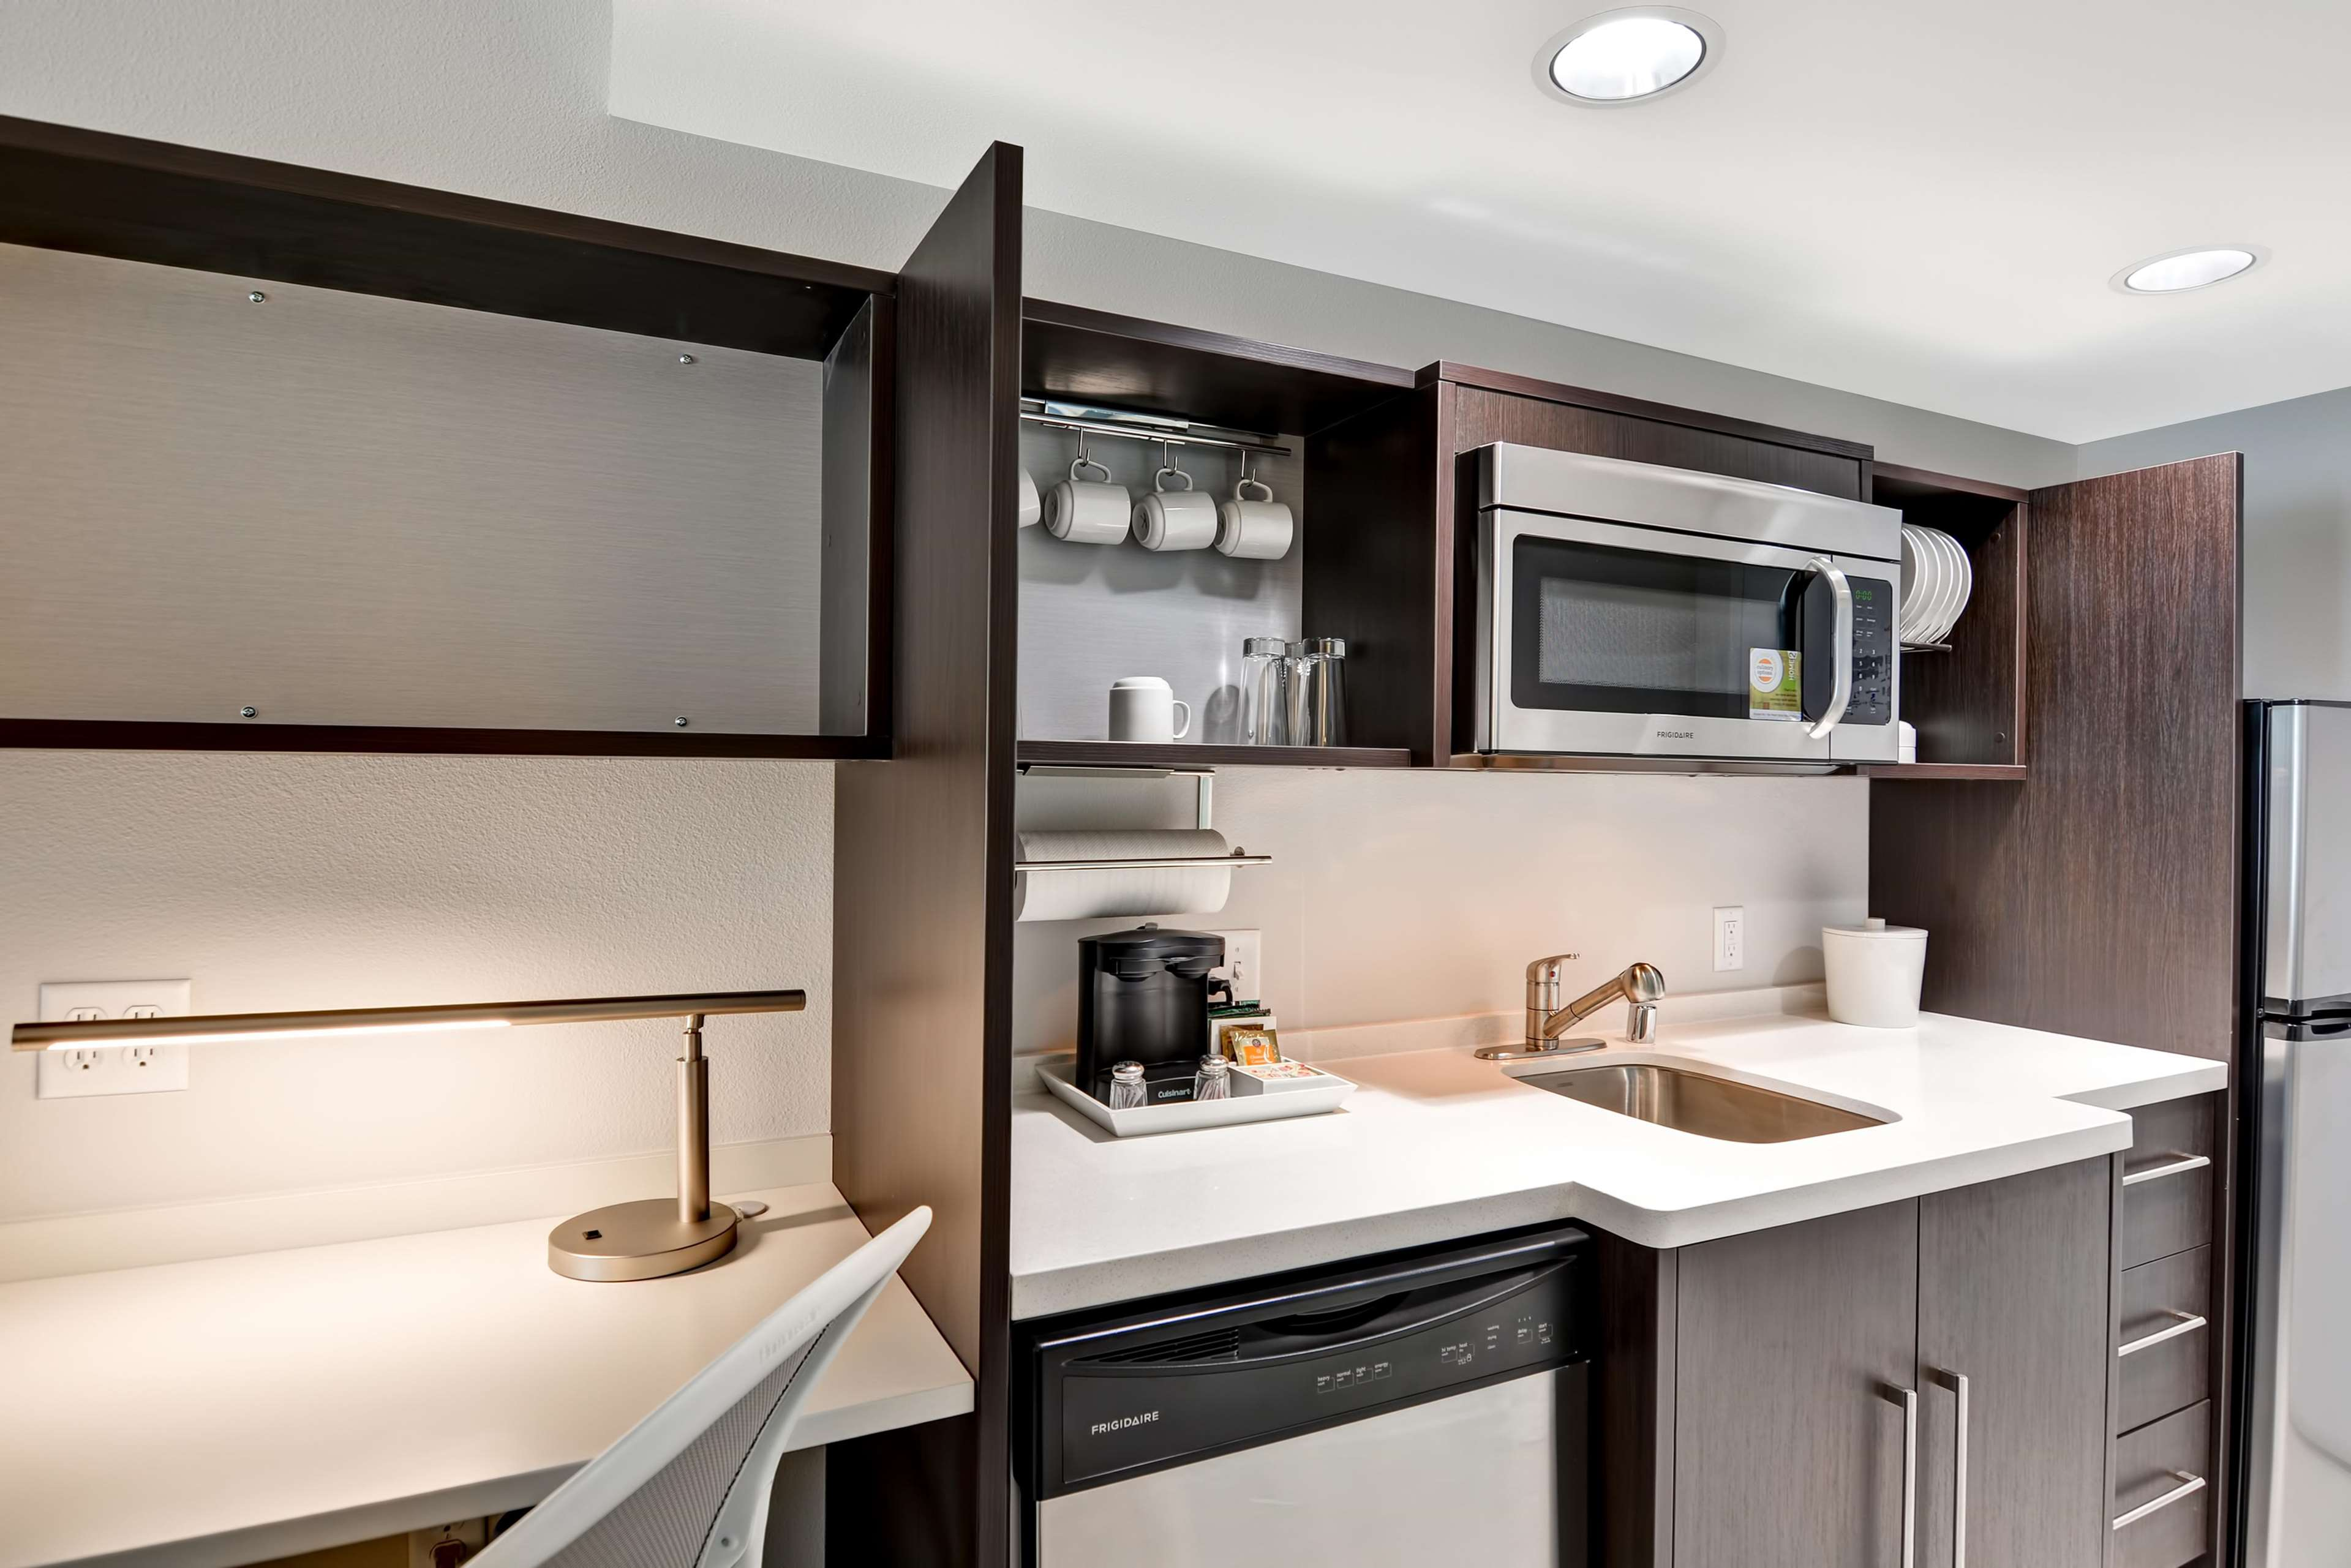 Home2 Suites by Hilton Azusa image 23